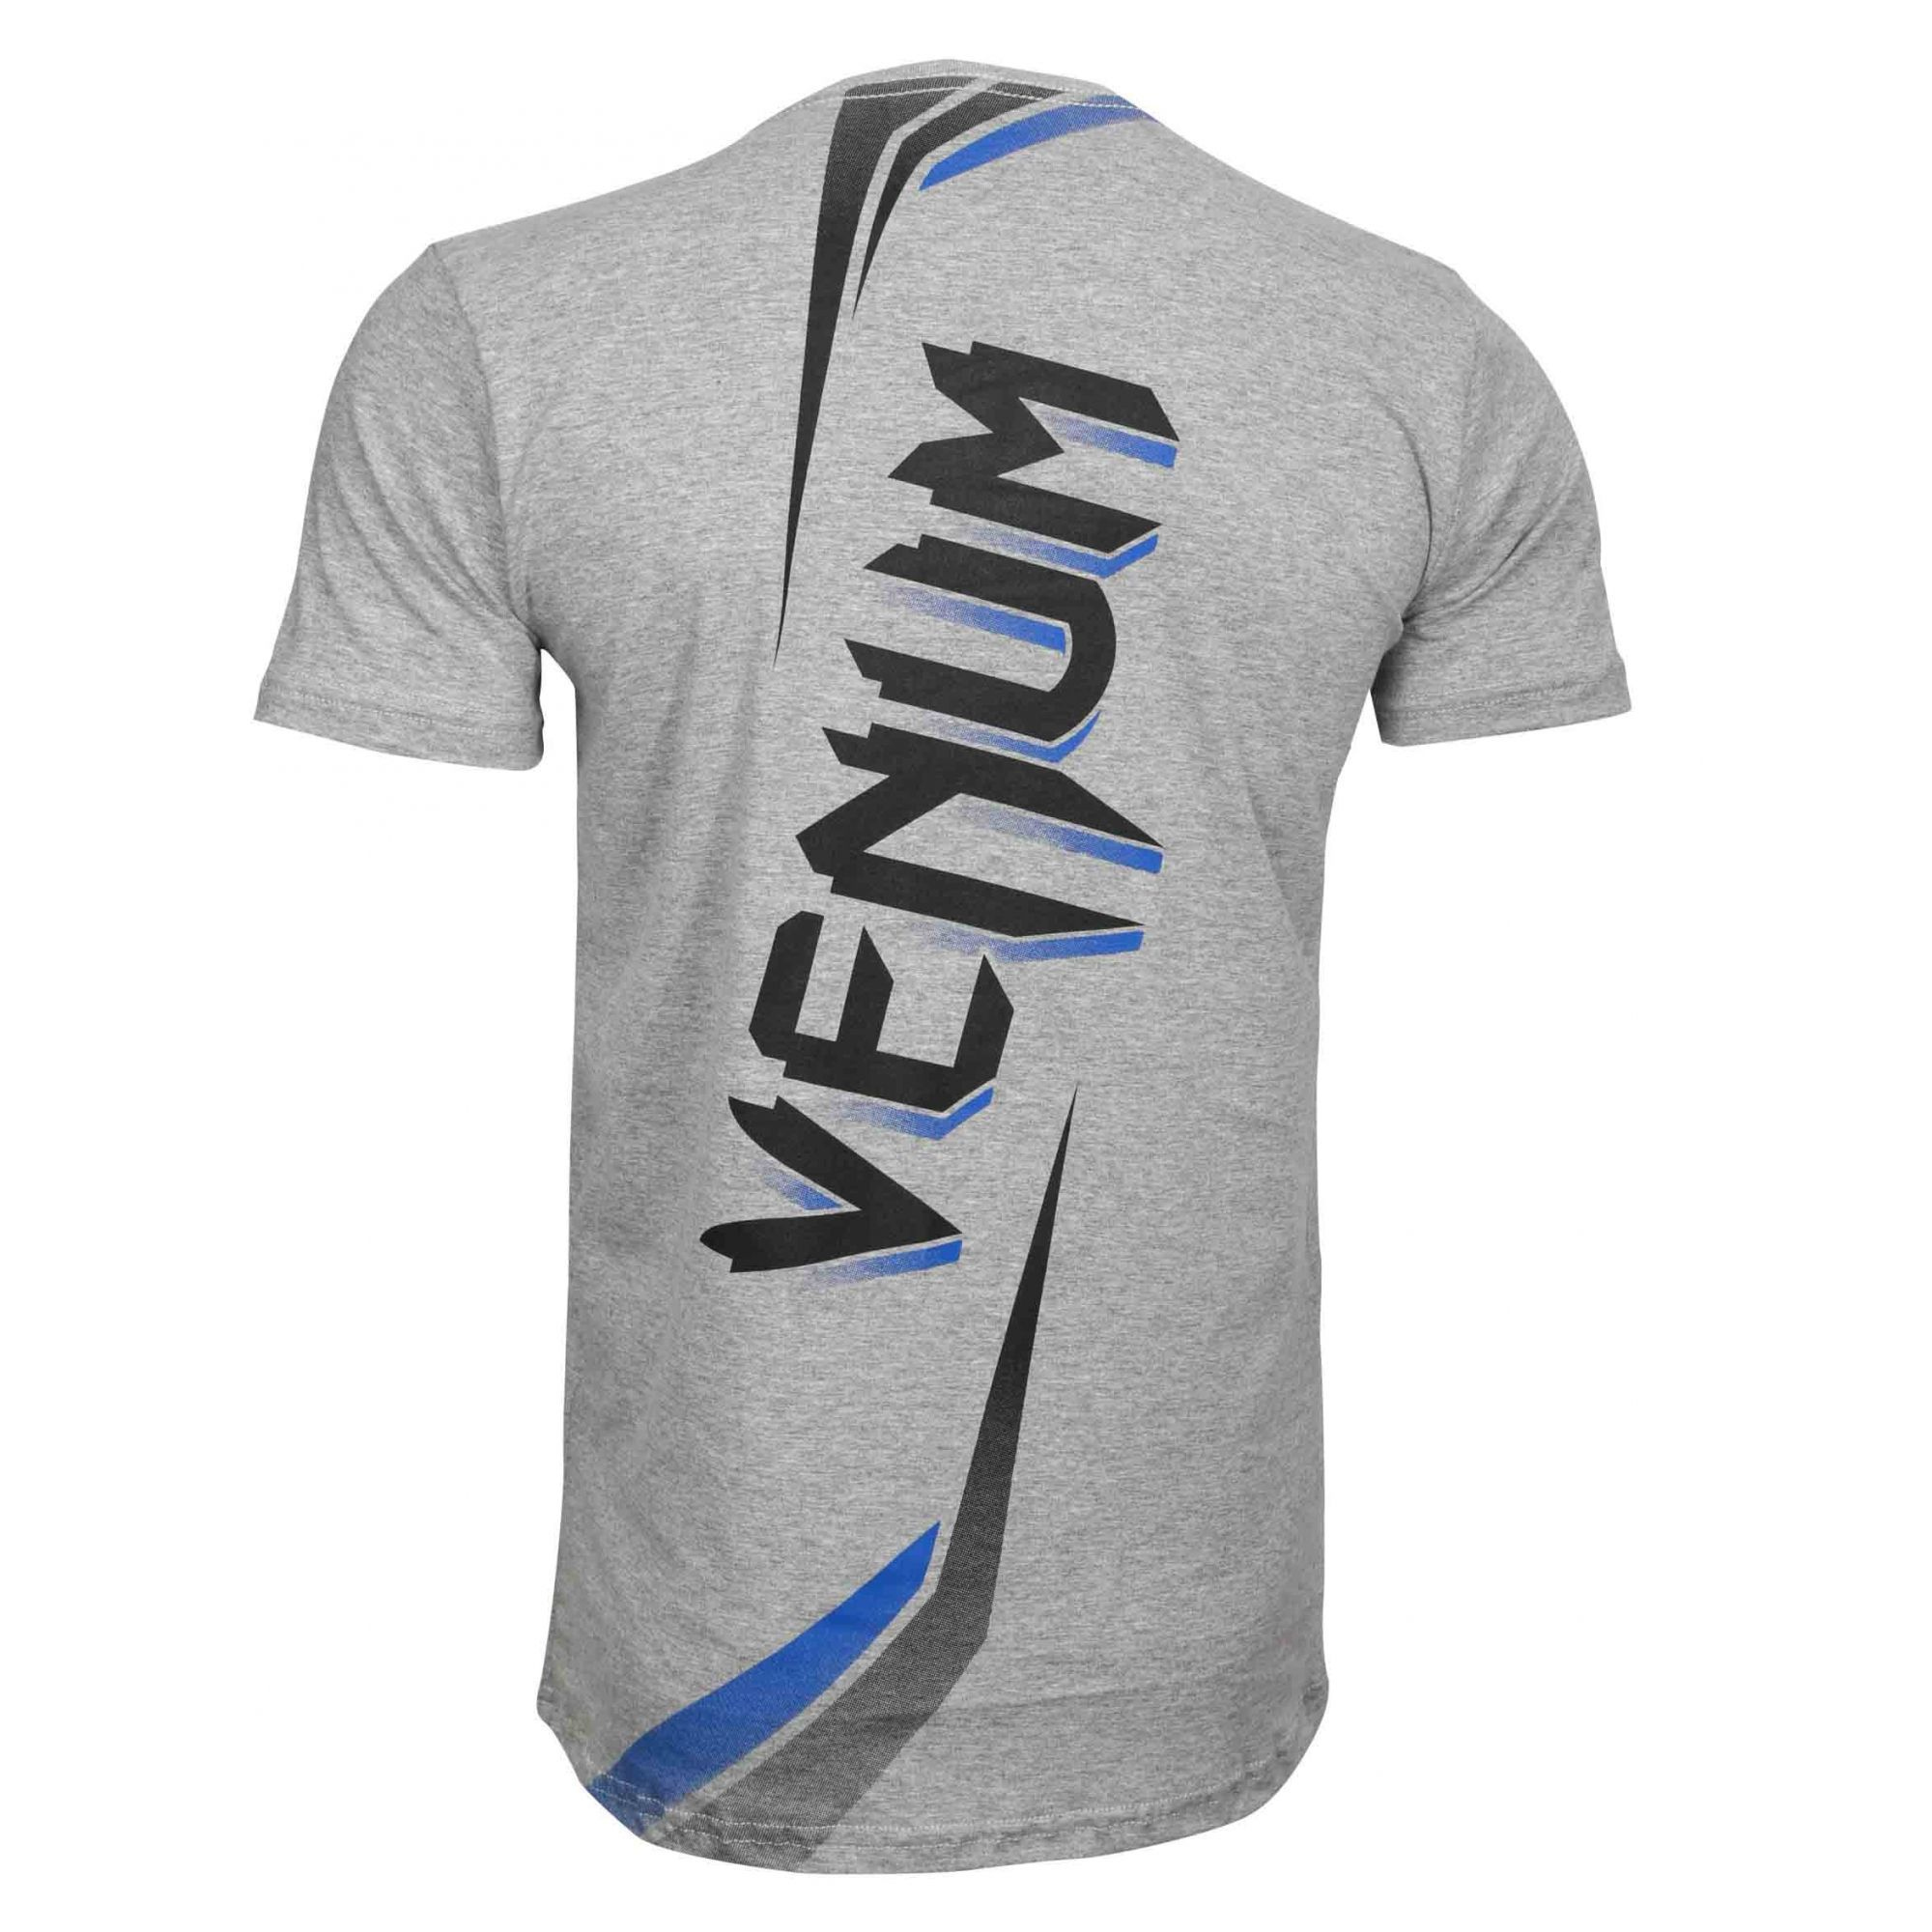 Camisa Camiseta Challenger Blade - Cinza - Venum -  - Loja do Competidor